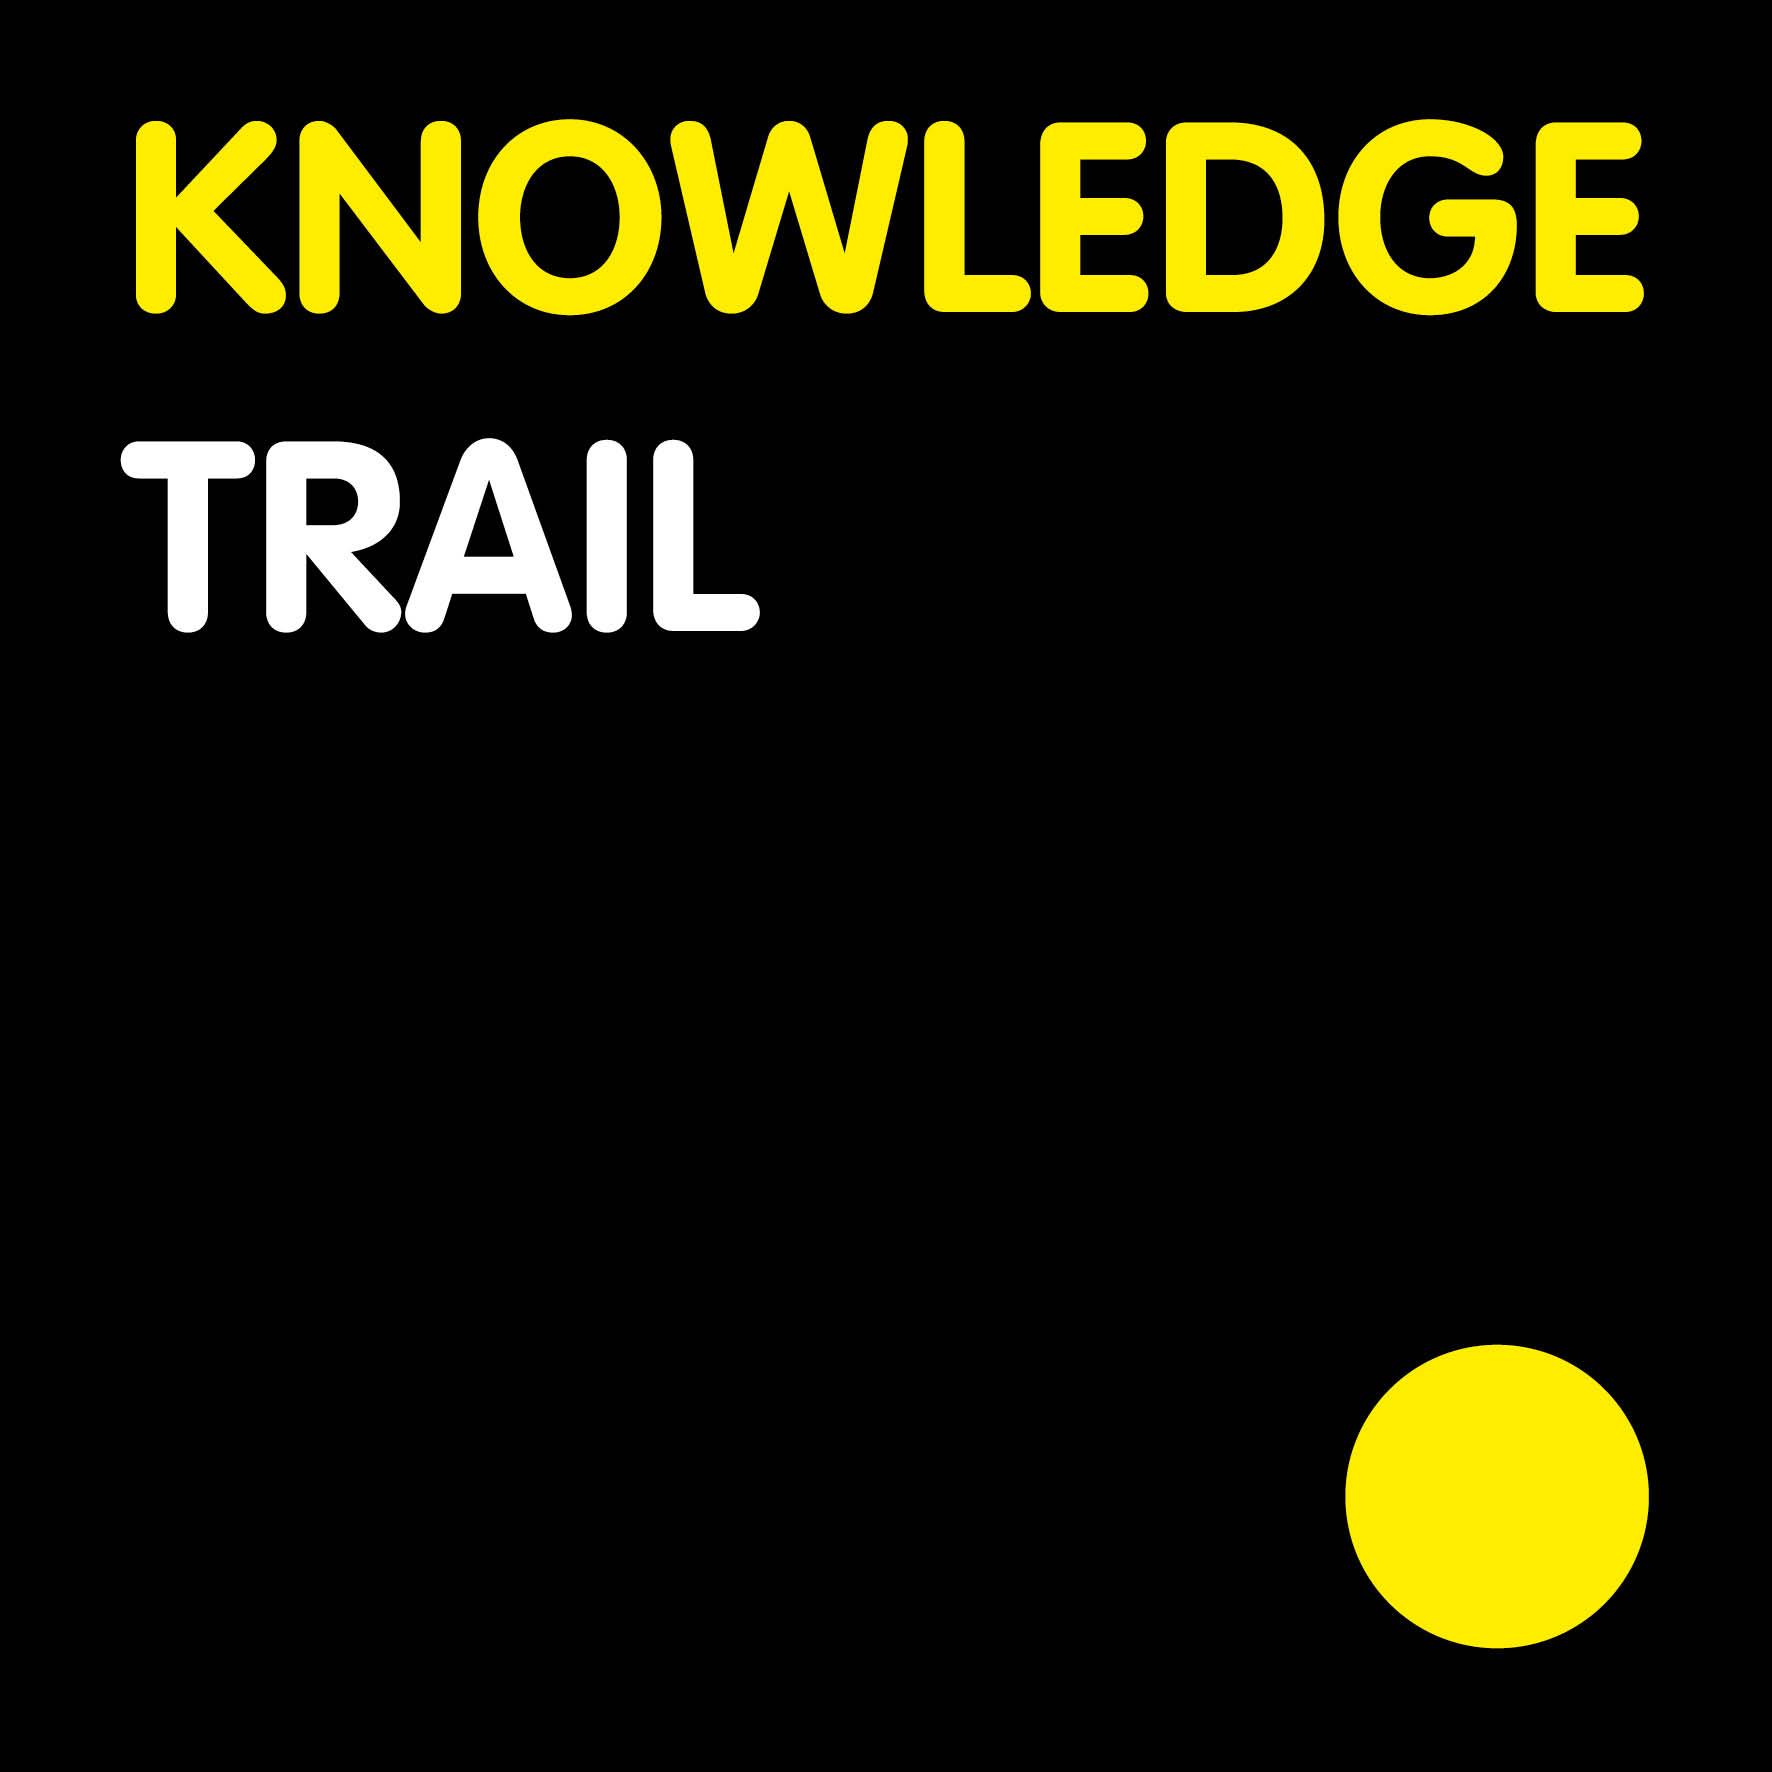 Logo knowledge trail